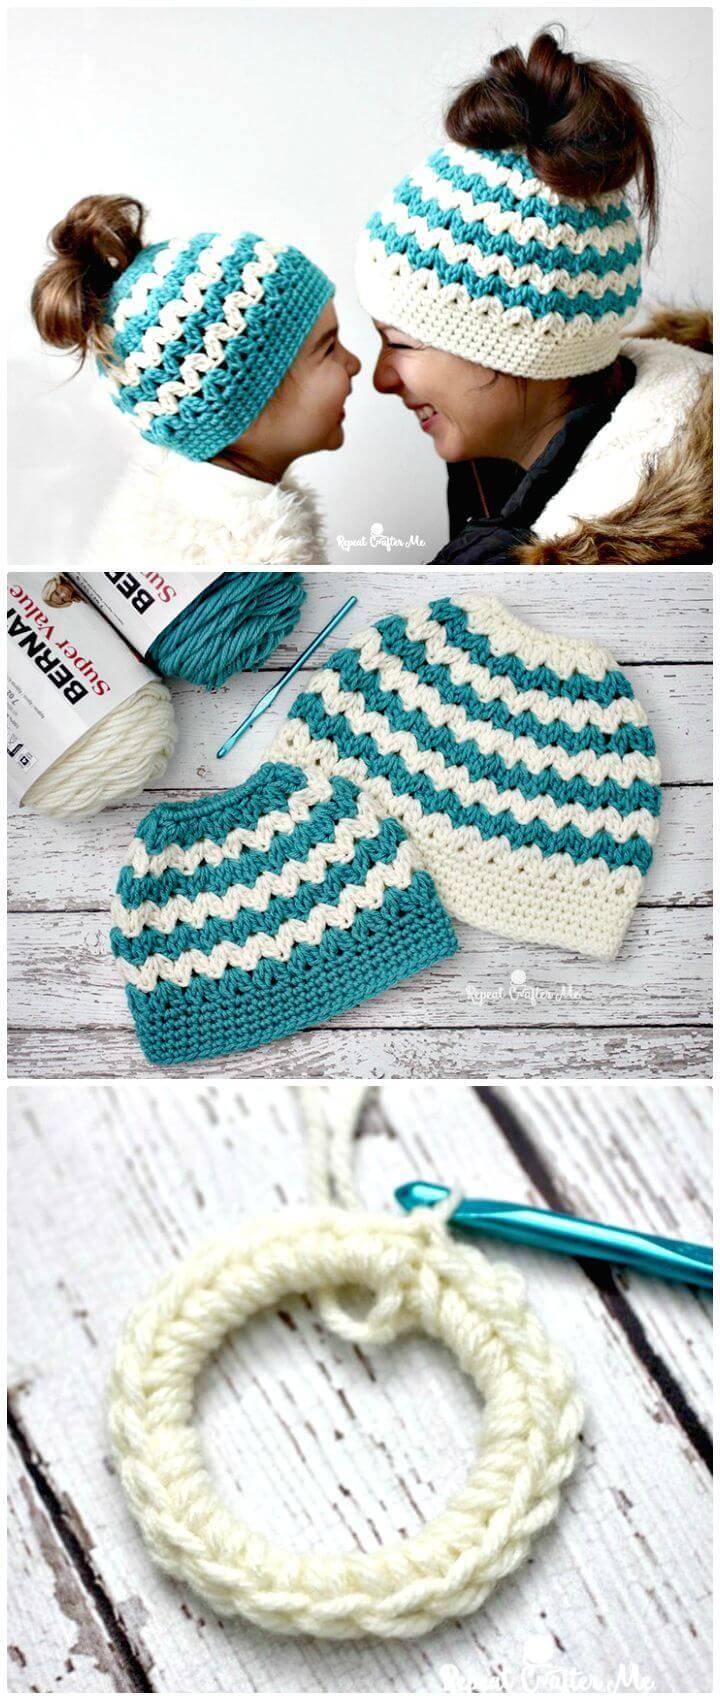 5cde59a4516 20 Free Crochet Messy Bun Hat Patterns - DIY Crafts